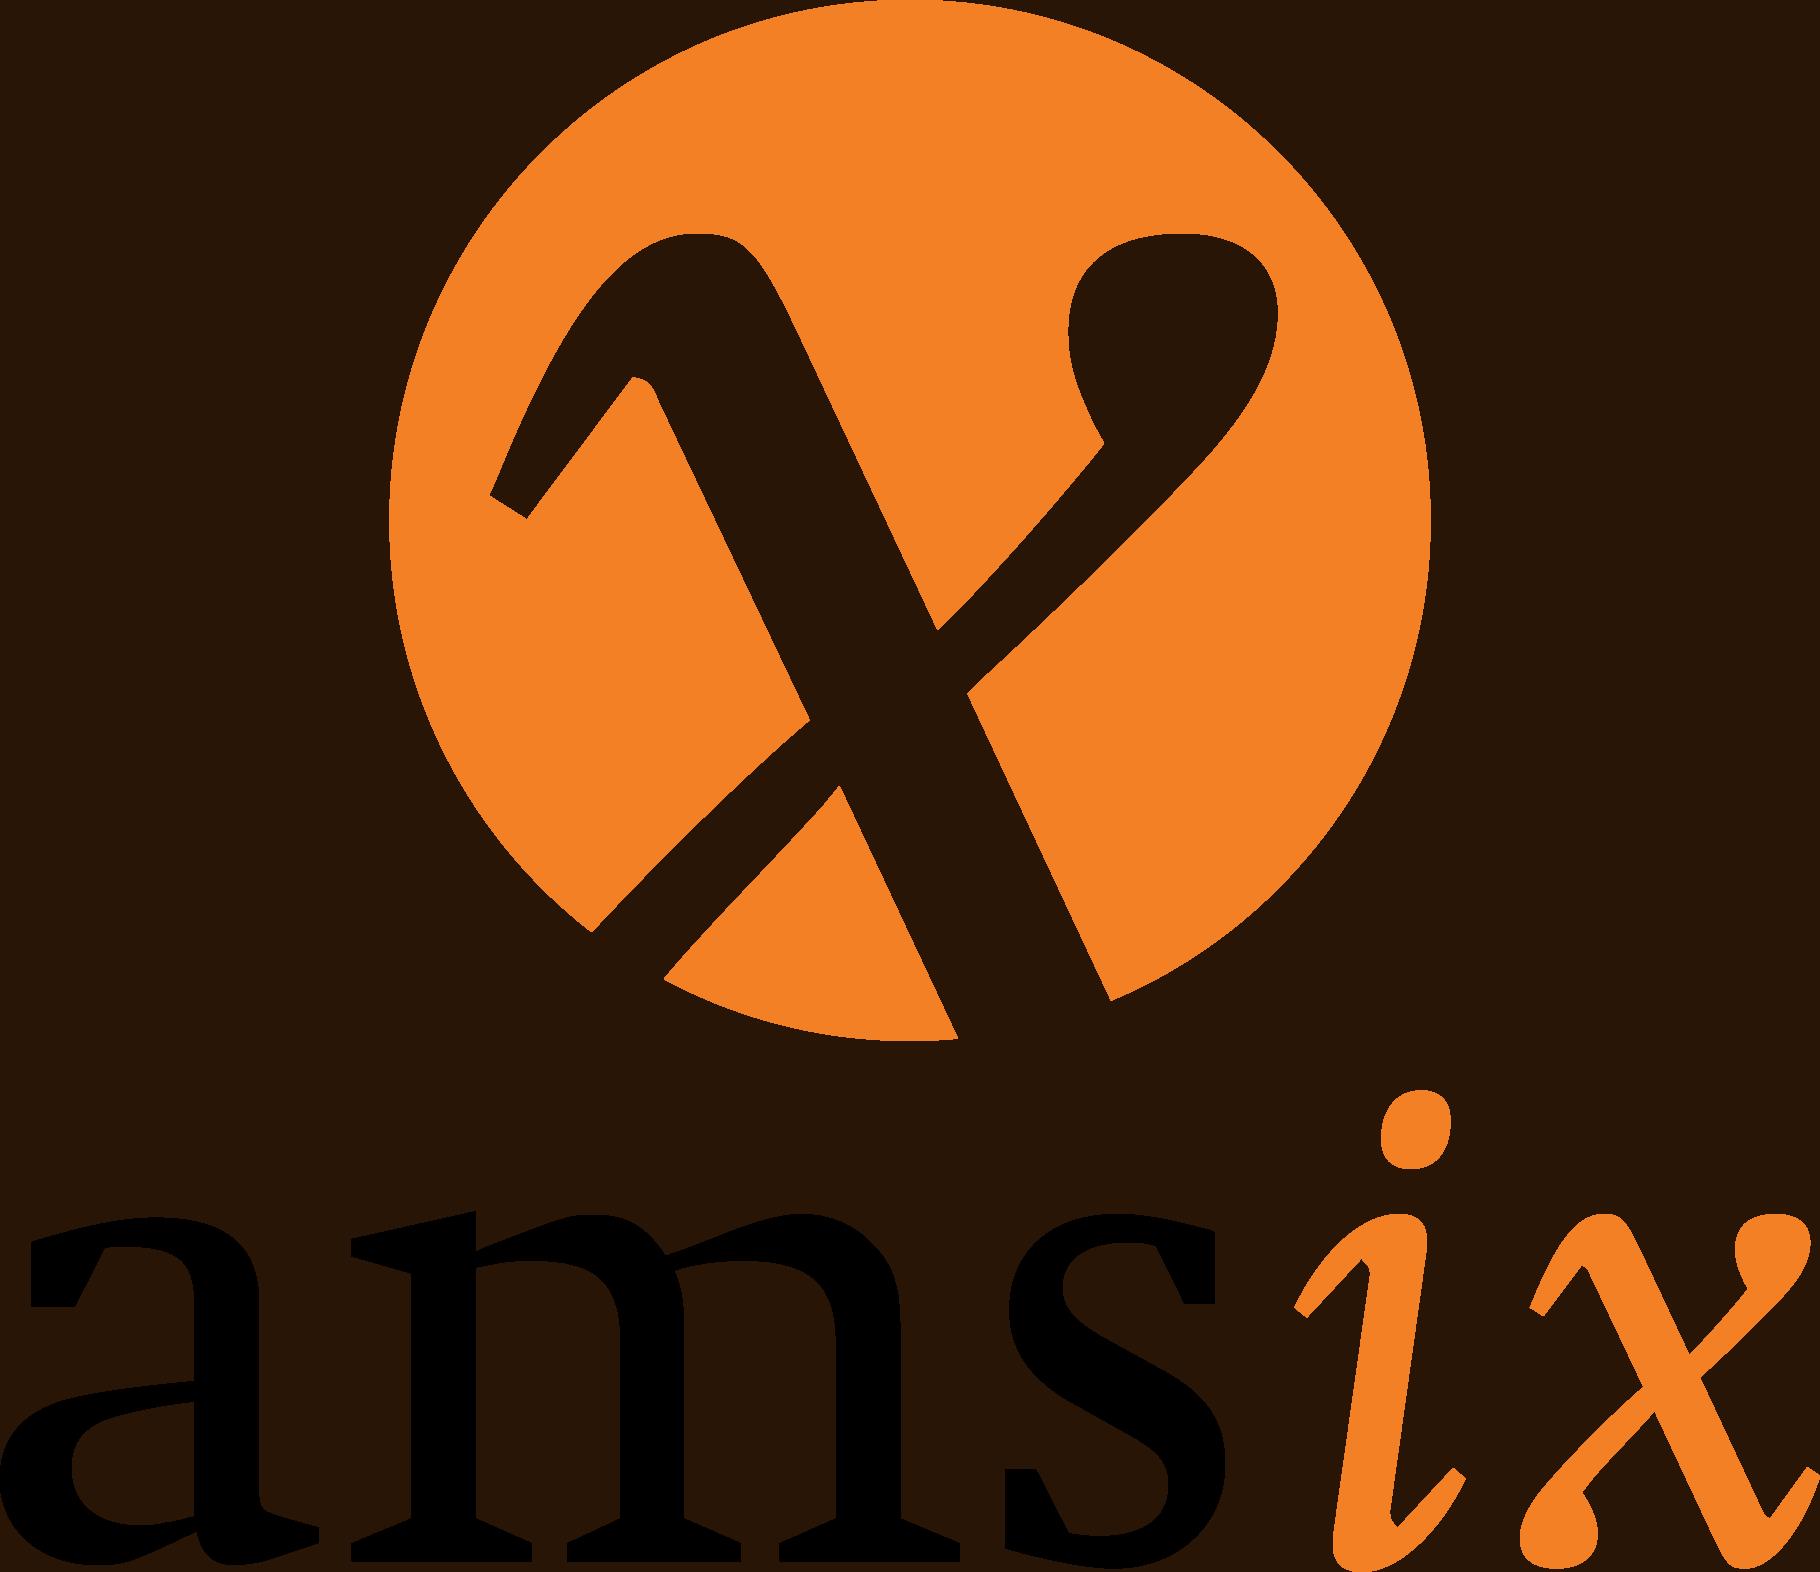 AMS-IX_logo_CMYK_Transparent_no title (1)